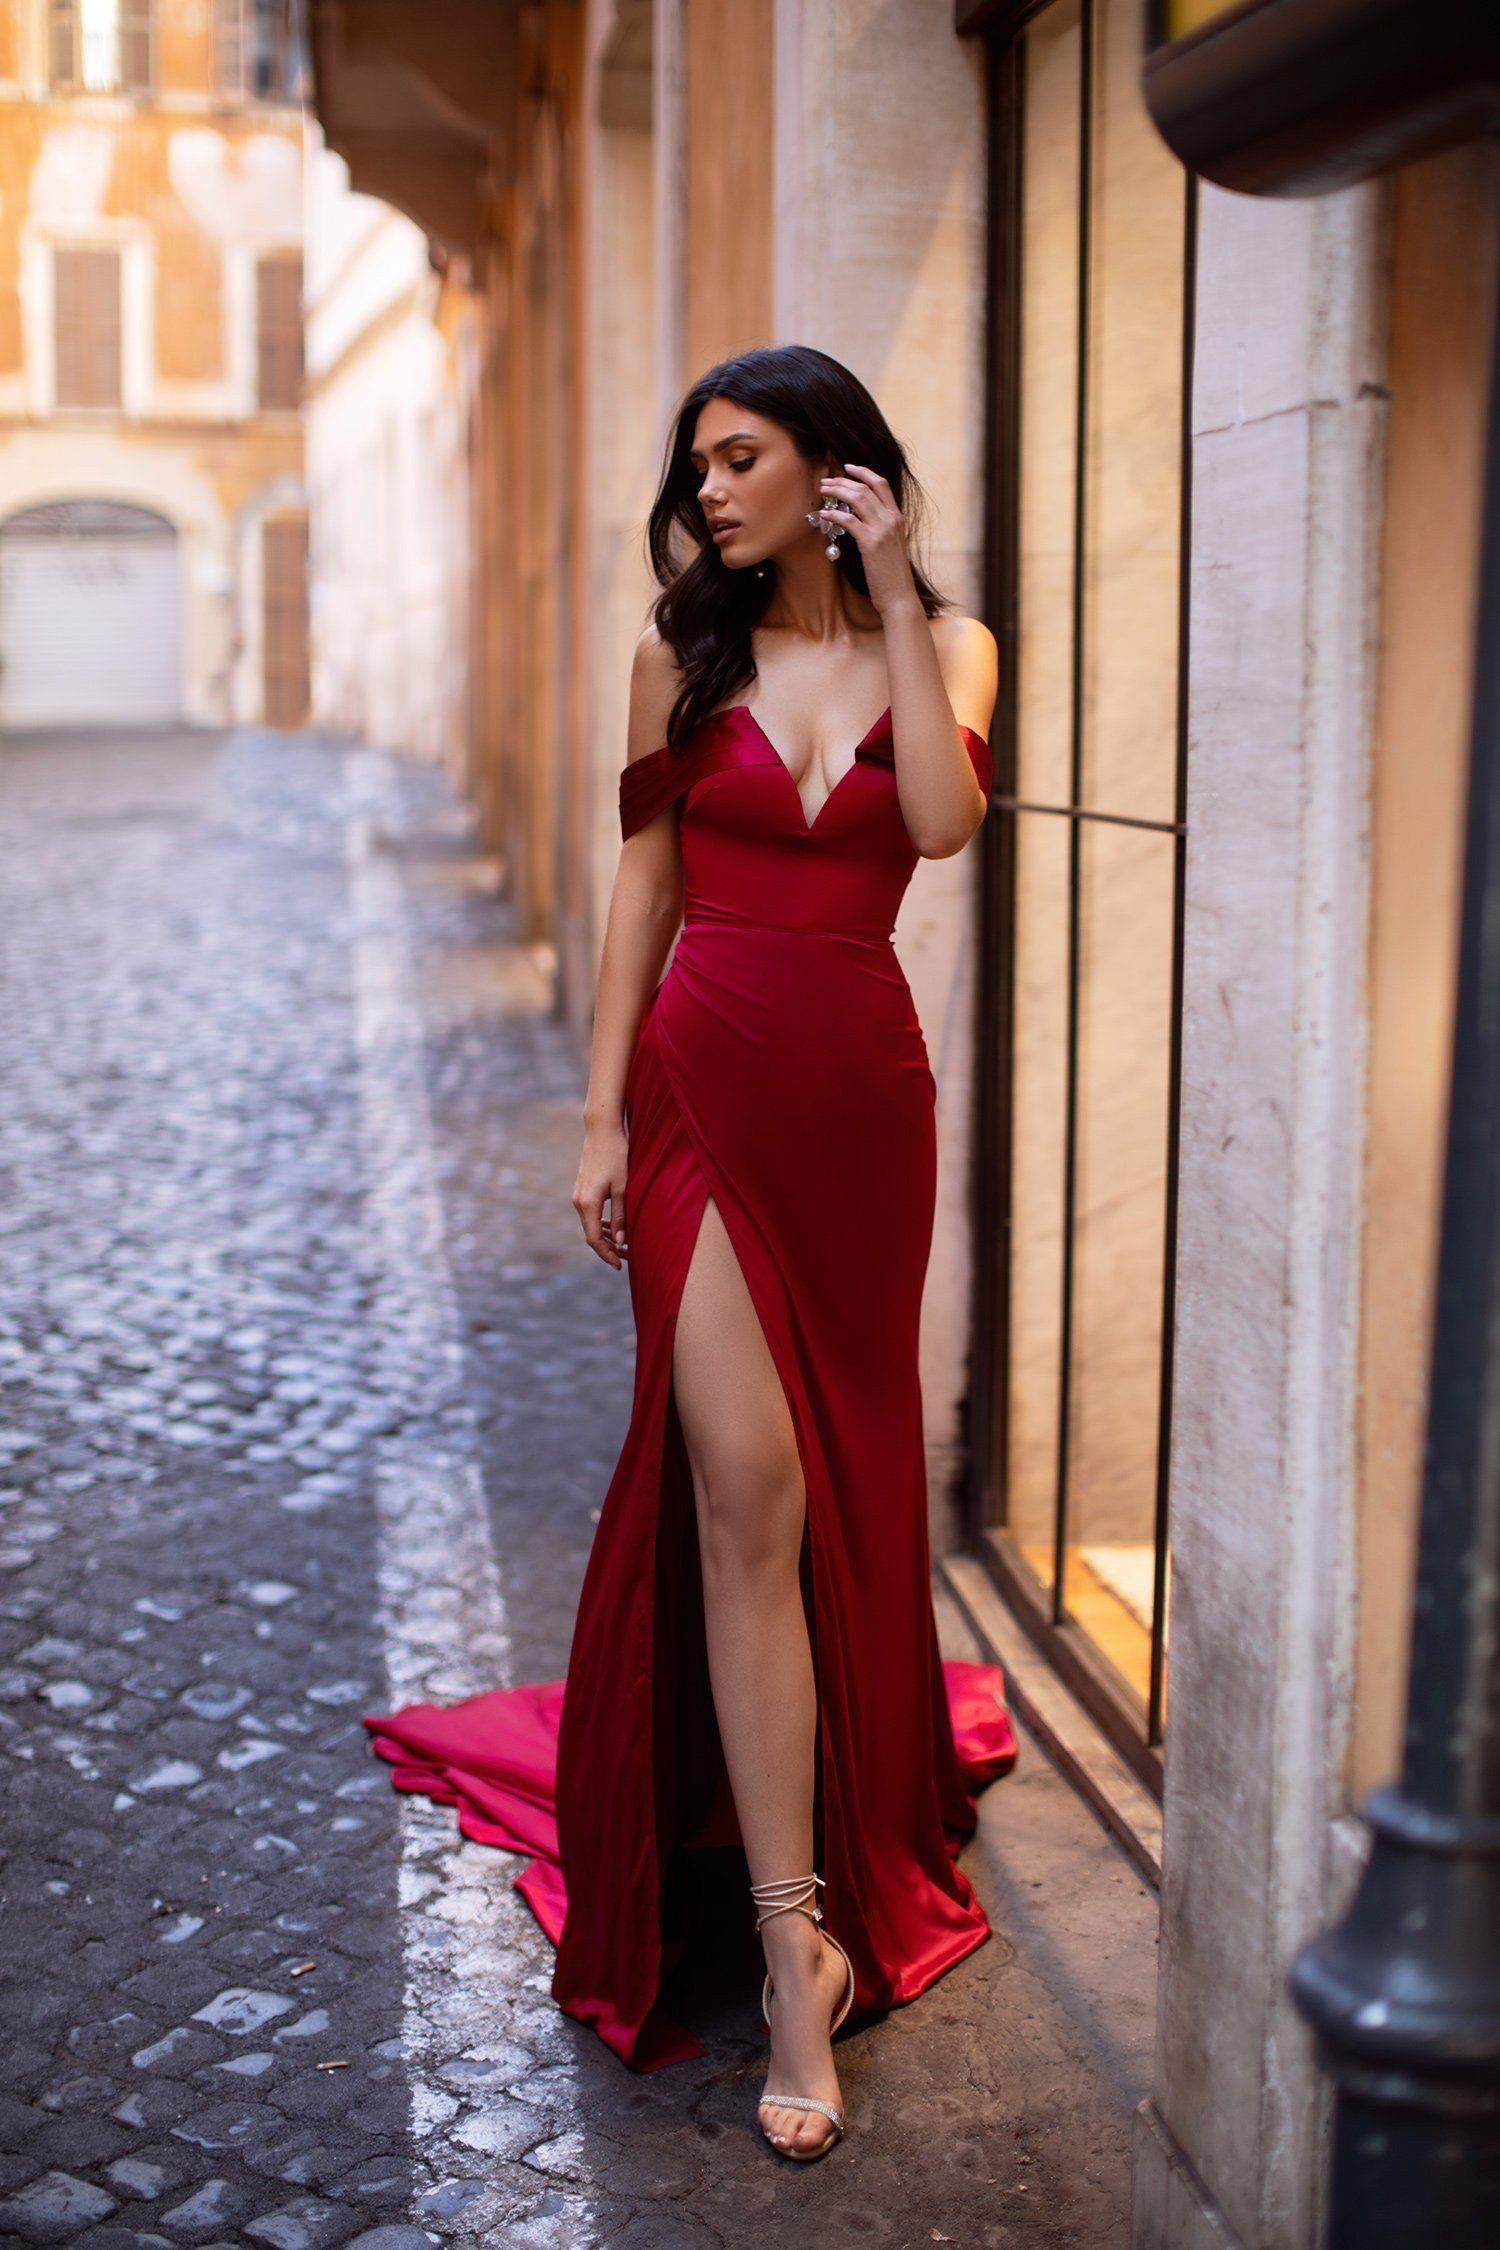 Lorenza Wine Red Long Mermaid Dress Red Formal Gown Fancy Dresses [ 2250 x 1500 Pixel ]